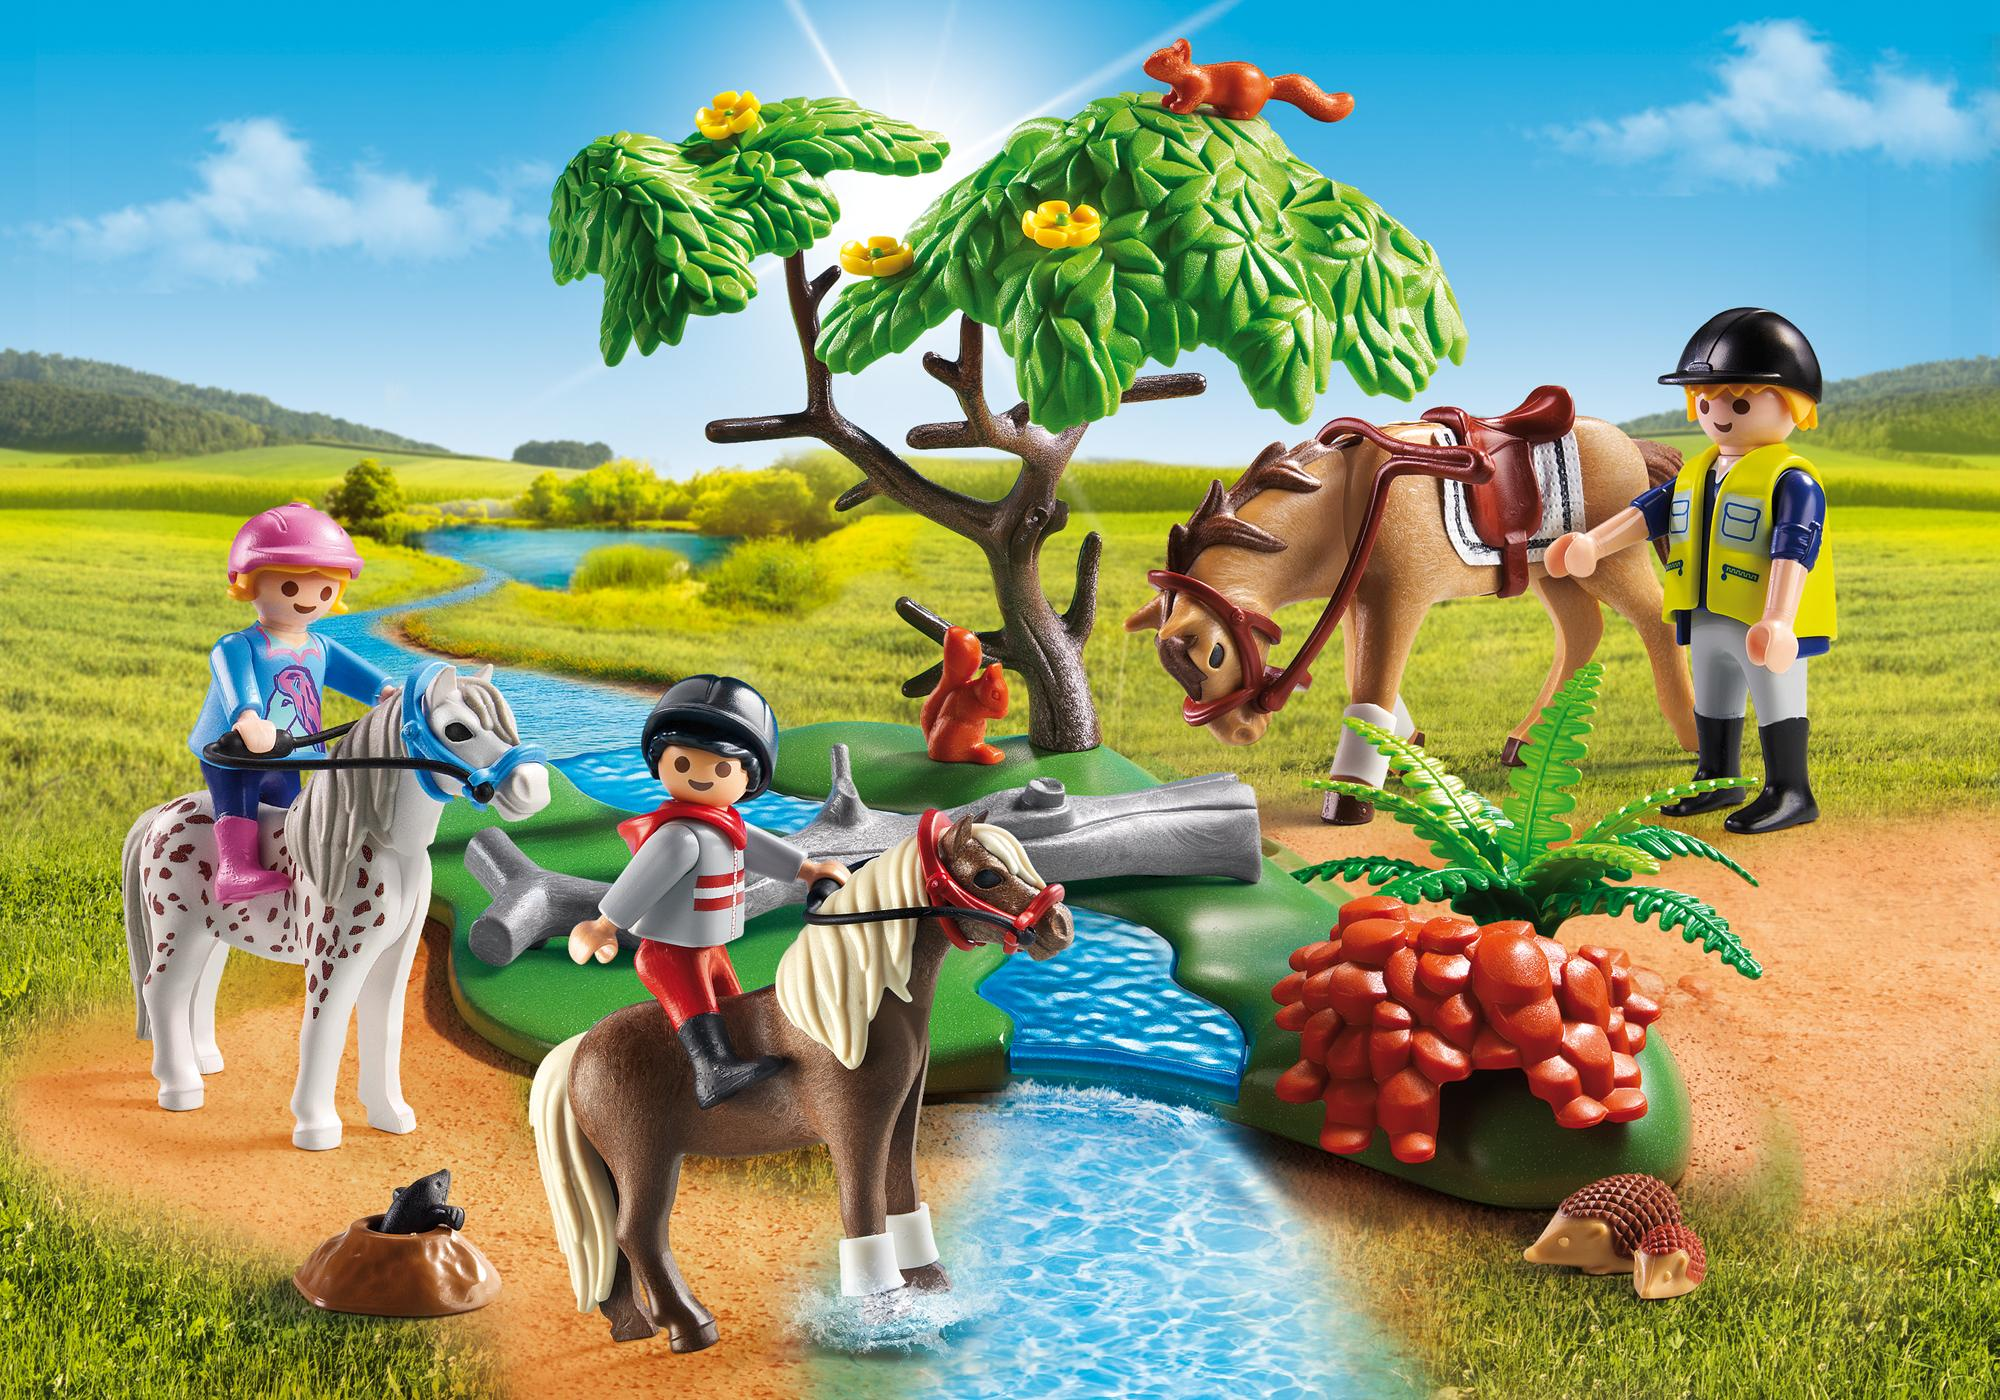 http://media.playmobil.com/i/playmobil/5685_product_detail/Country Horseback Ride